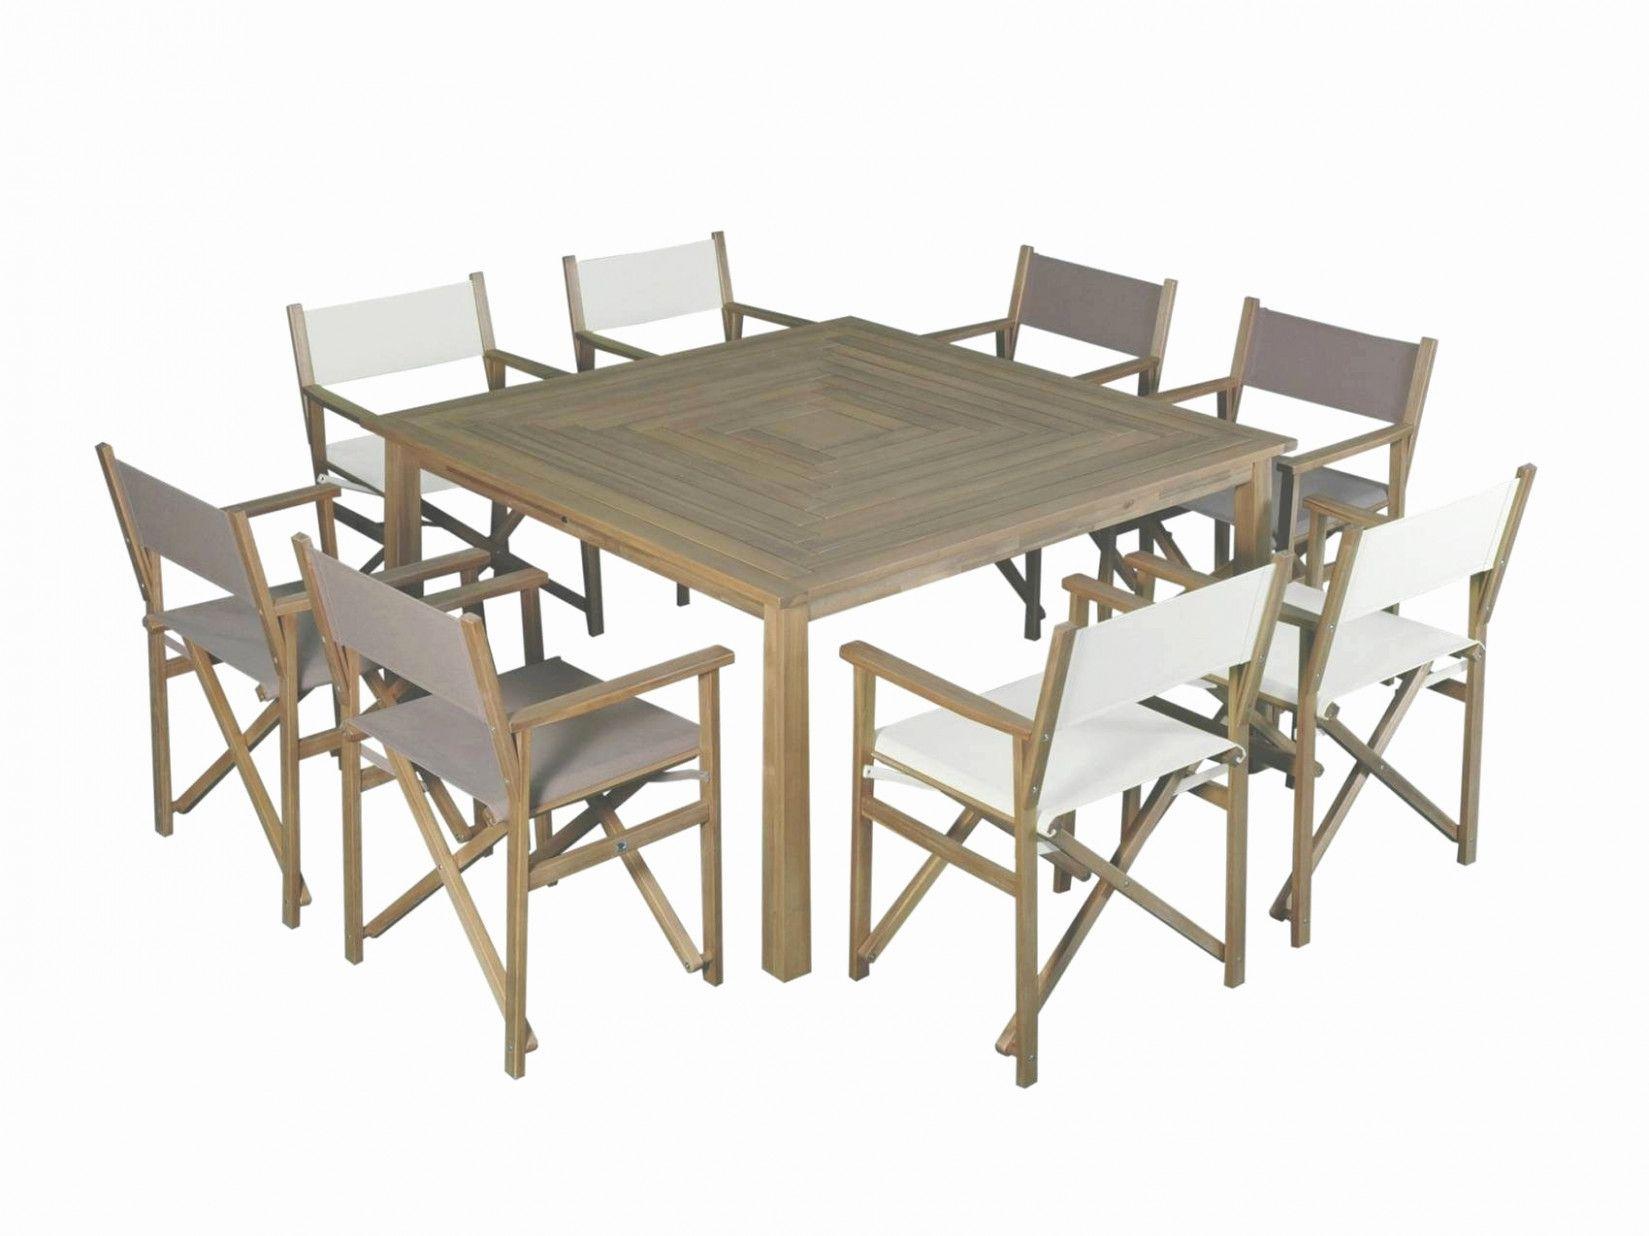 Table De Jardin Leclerc Jardin Furniture Sets Small Round Kitchen Table Bedroom Furniture Sets